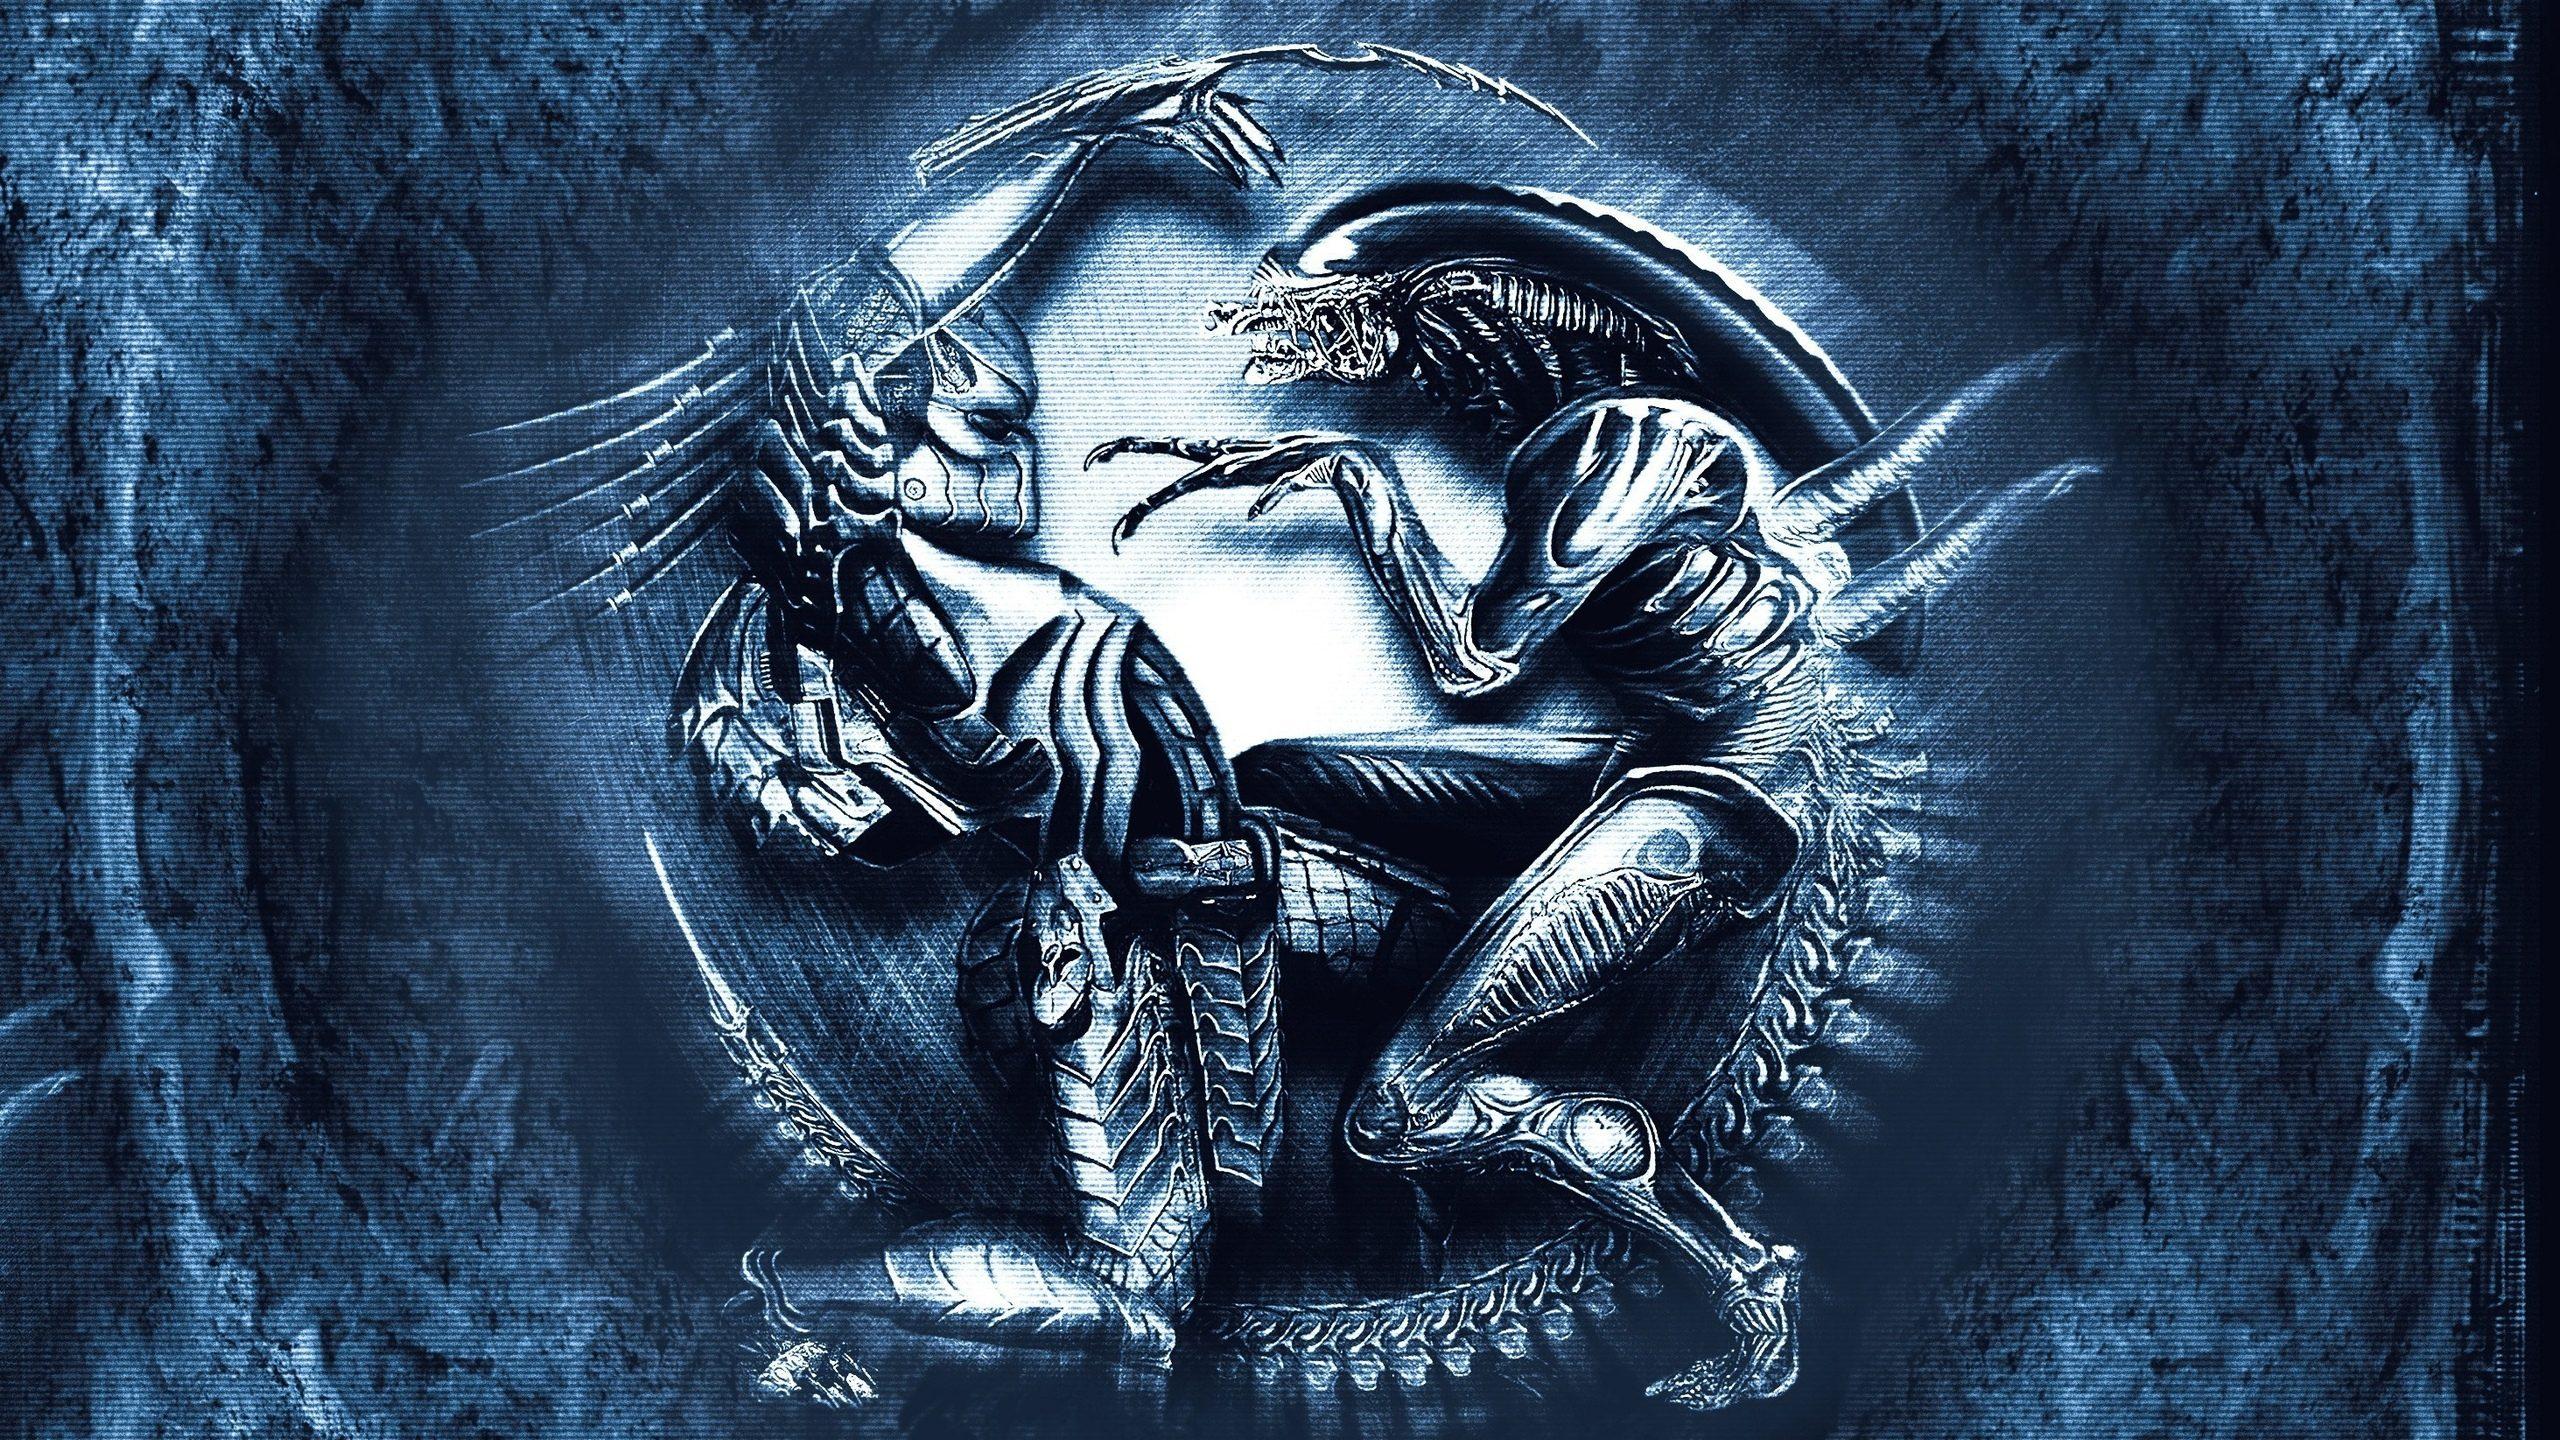 Cute Anime Alien Wallpapers Xenomorph Vs Predator Hd Wallpaper